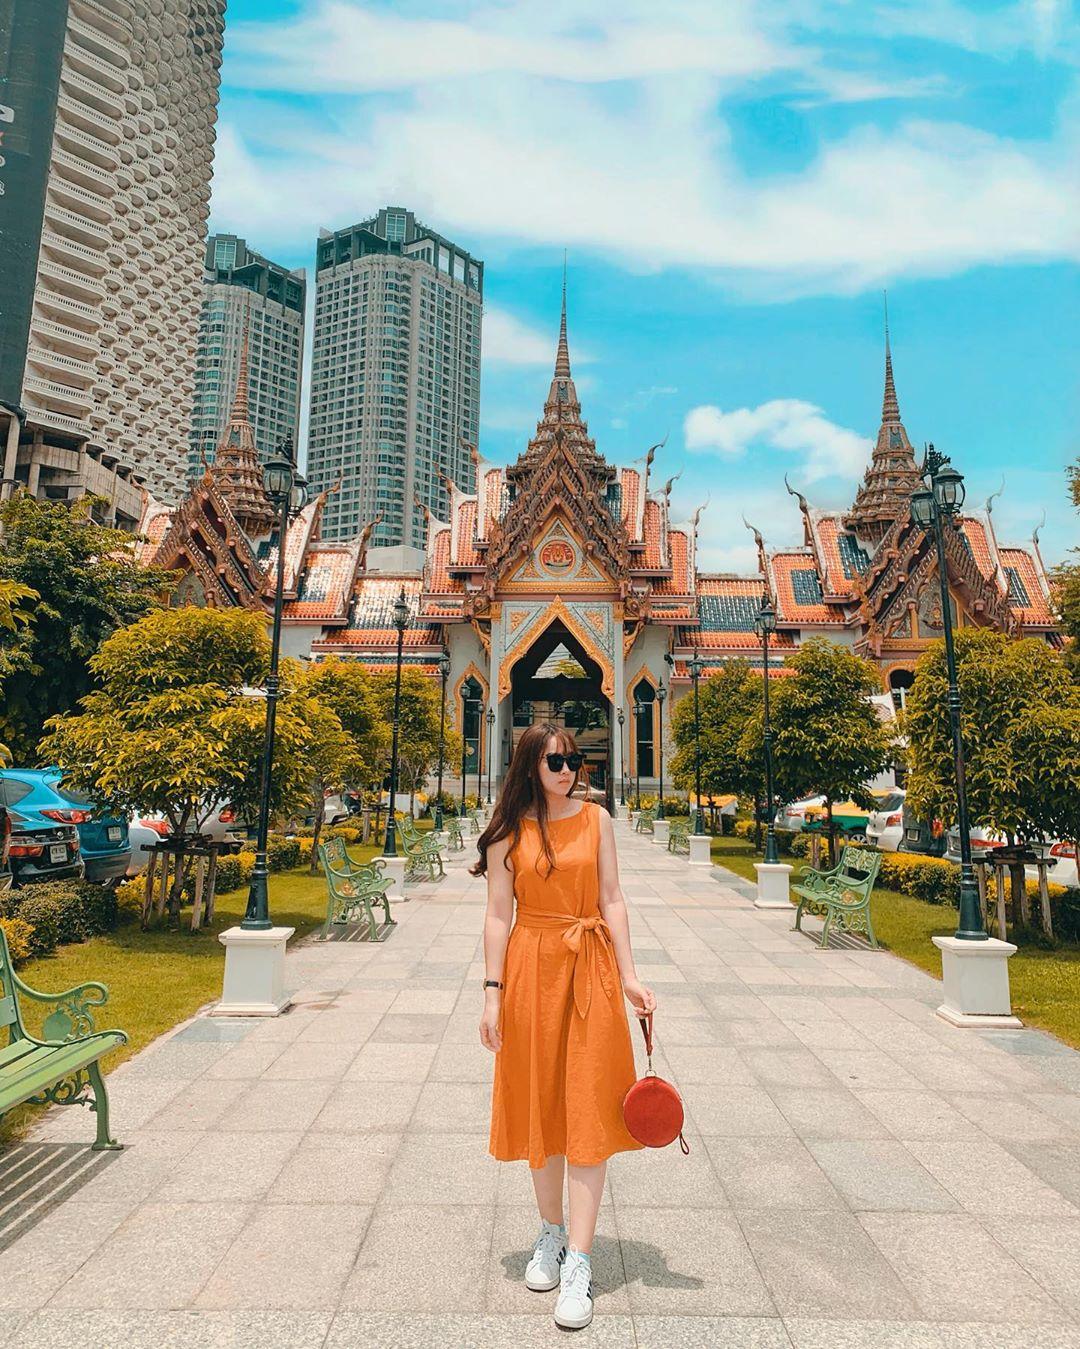 tour-thai-lan-5n4d-ha-noi-bangkok-Pattaya-cho-noi-4-mien-chi-voi-6490000-dong-ivivu-4